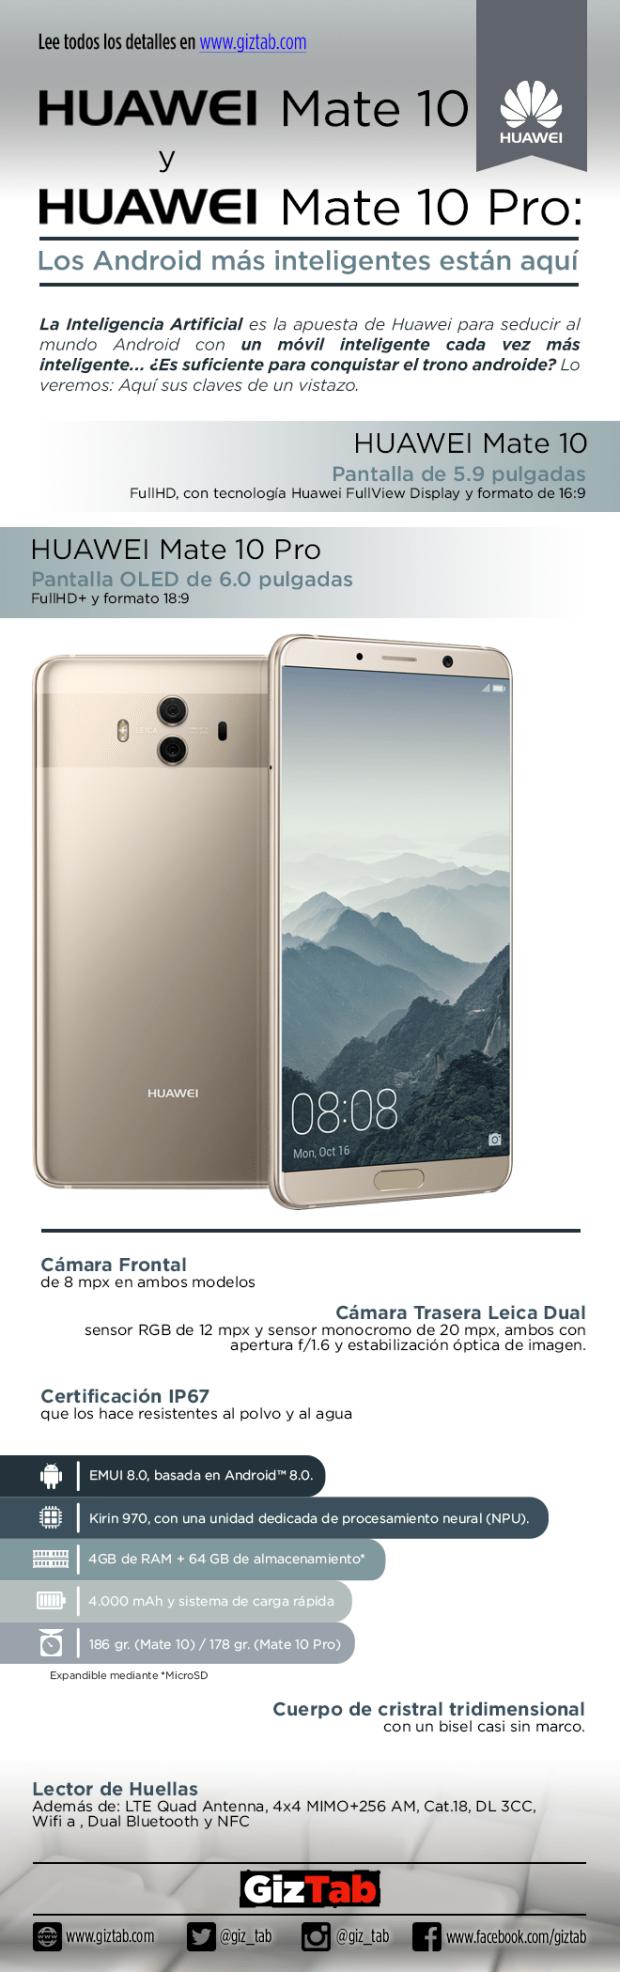 Infografía Huawei Mate 10 y Mate 10 Pro